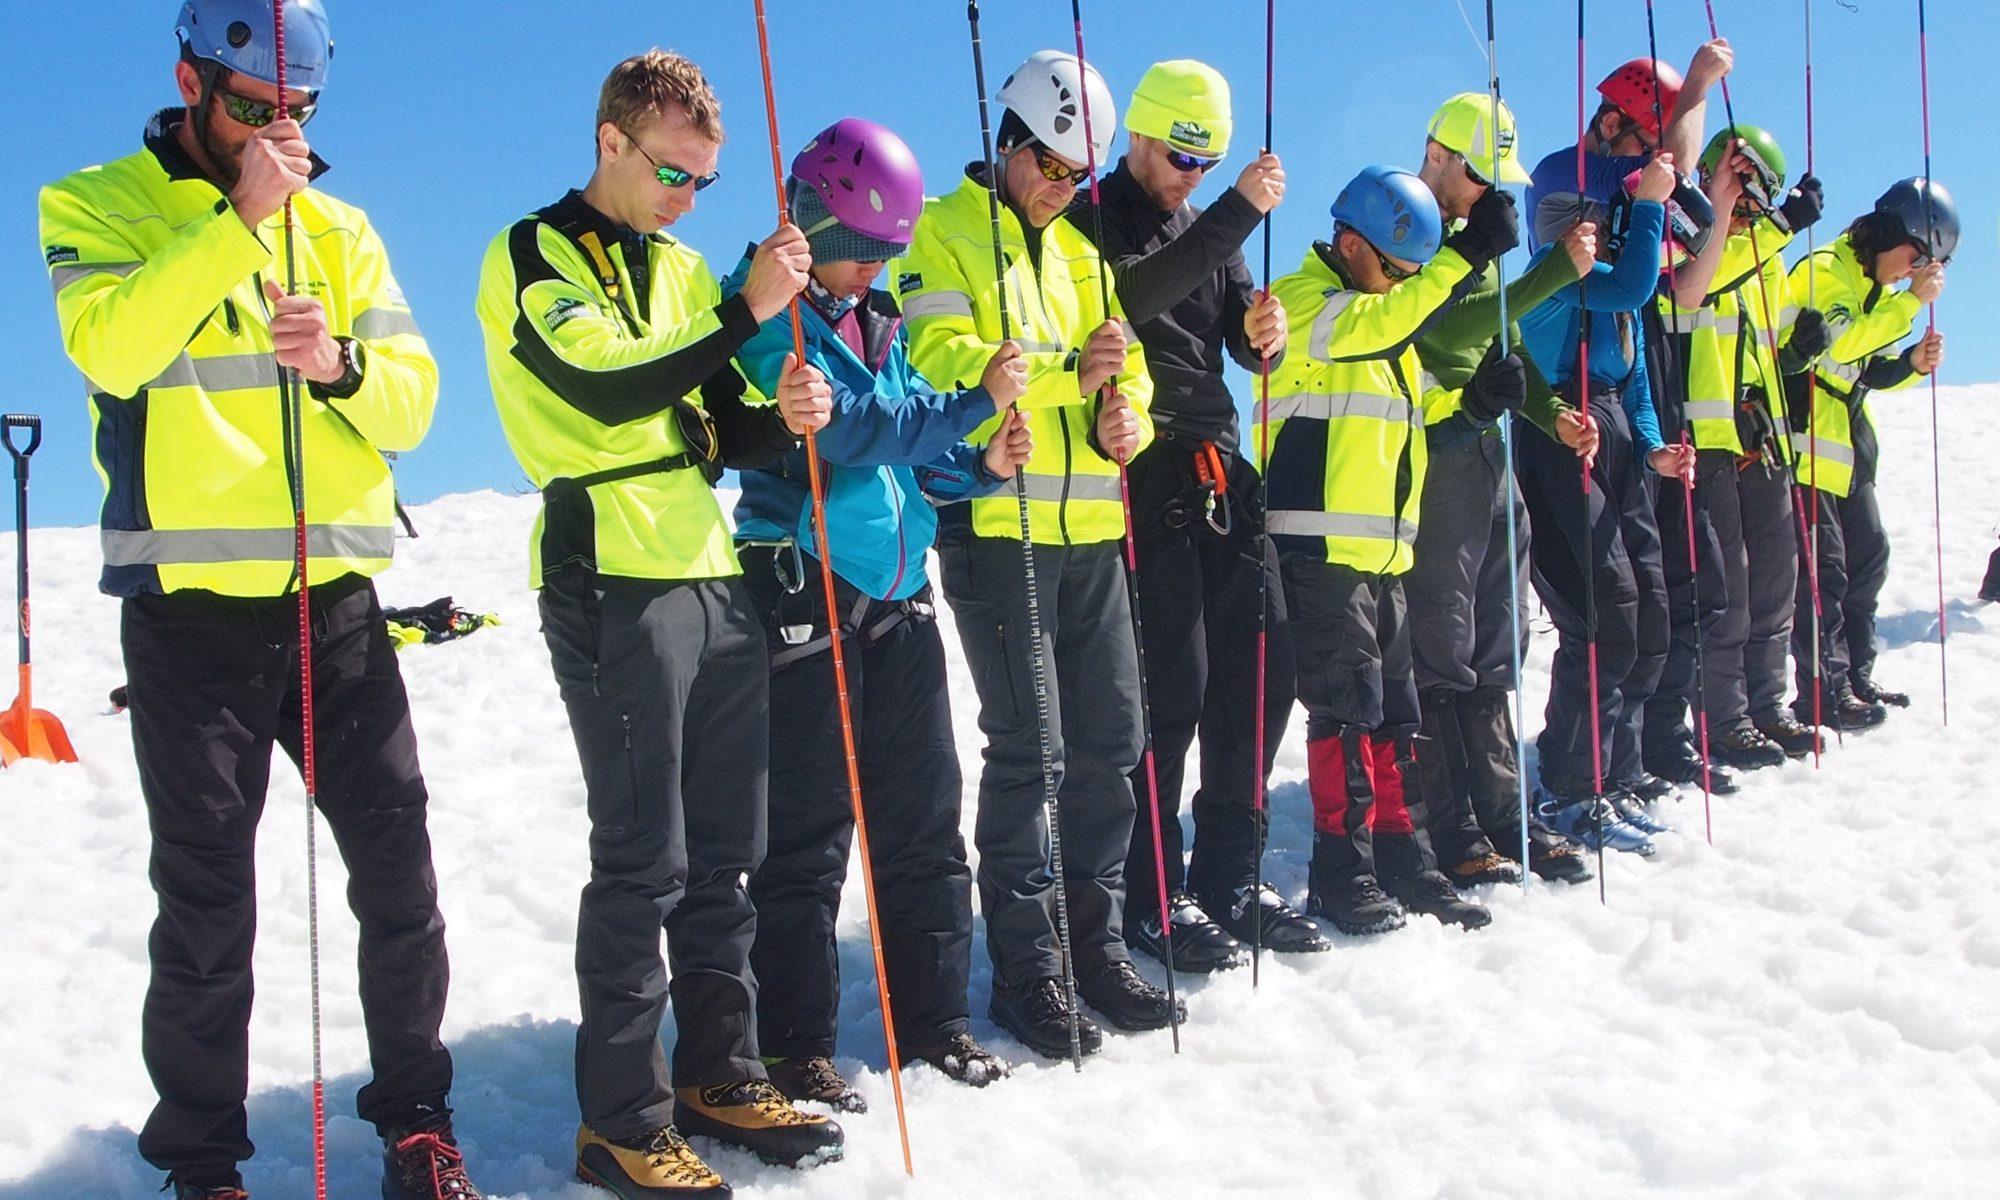 2014 BSAR Steep Snow Ice training at Razorback